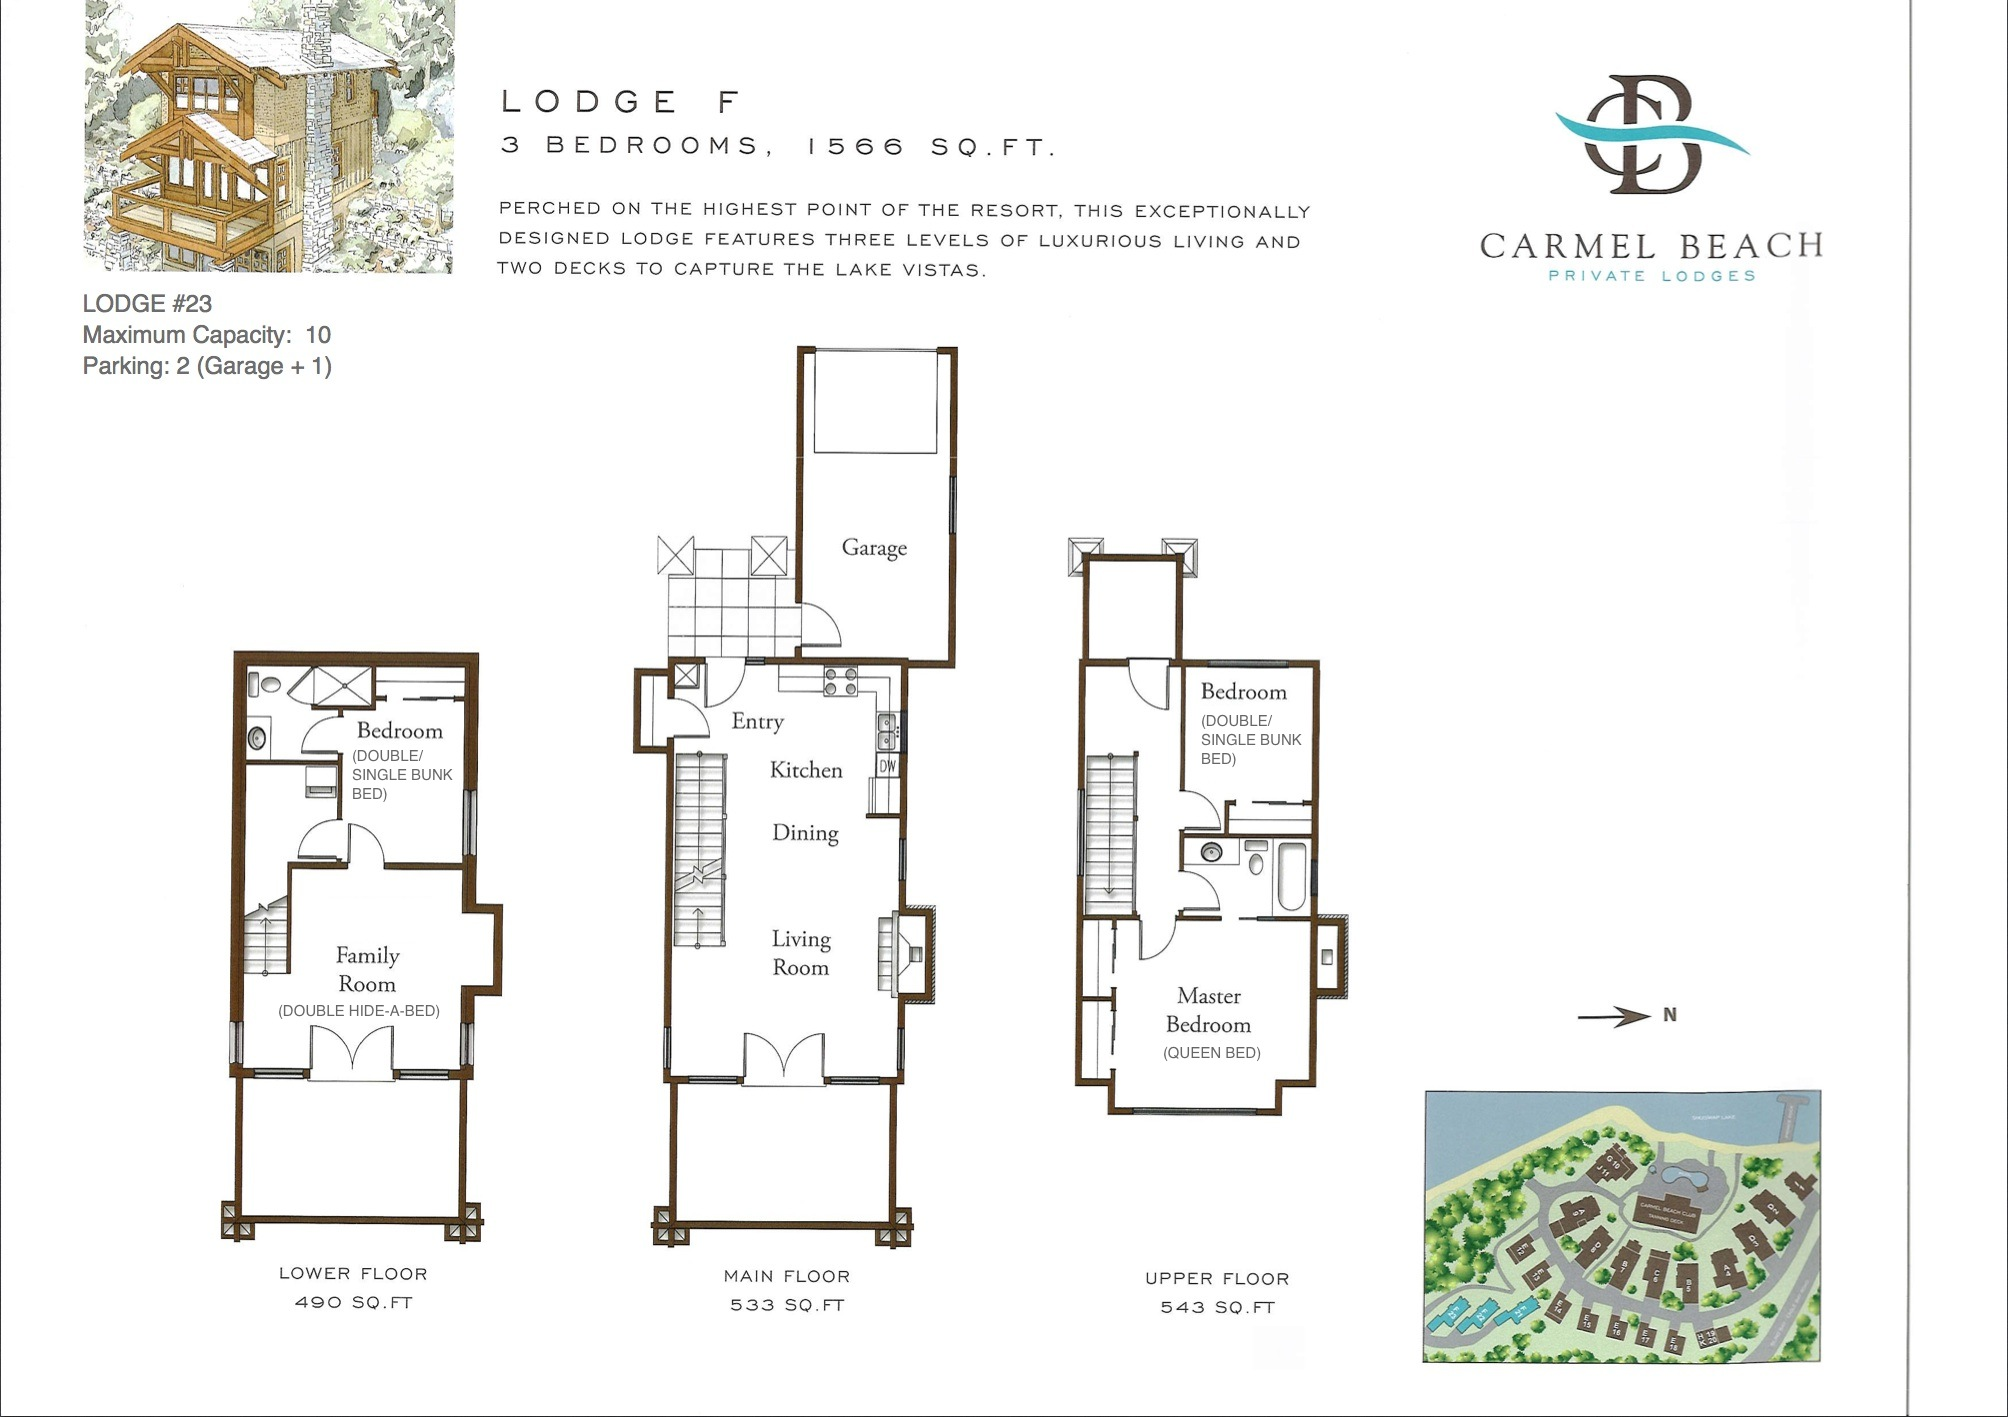 Lodge 23 Floor Plan & Bedding Configuration